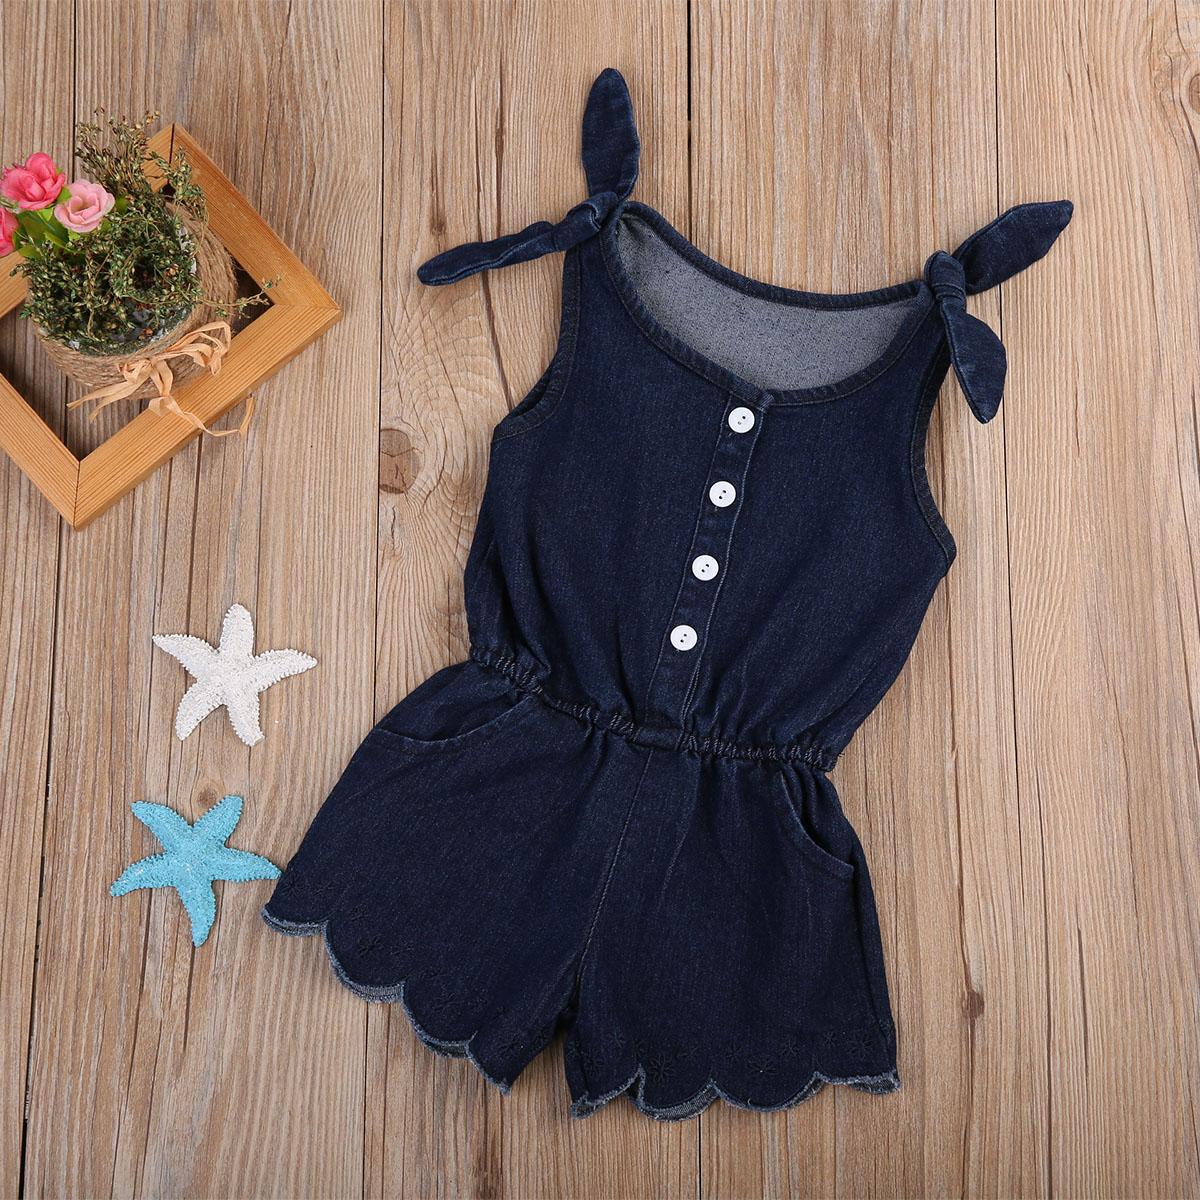 2d0868fe6dd16 Pudcoco 2017 Newborn Infant Baby Girl Navy Blue Romper Jumpsuit Outfits  Summer Sunsuit Clothes 0-24M